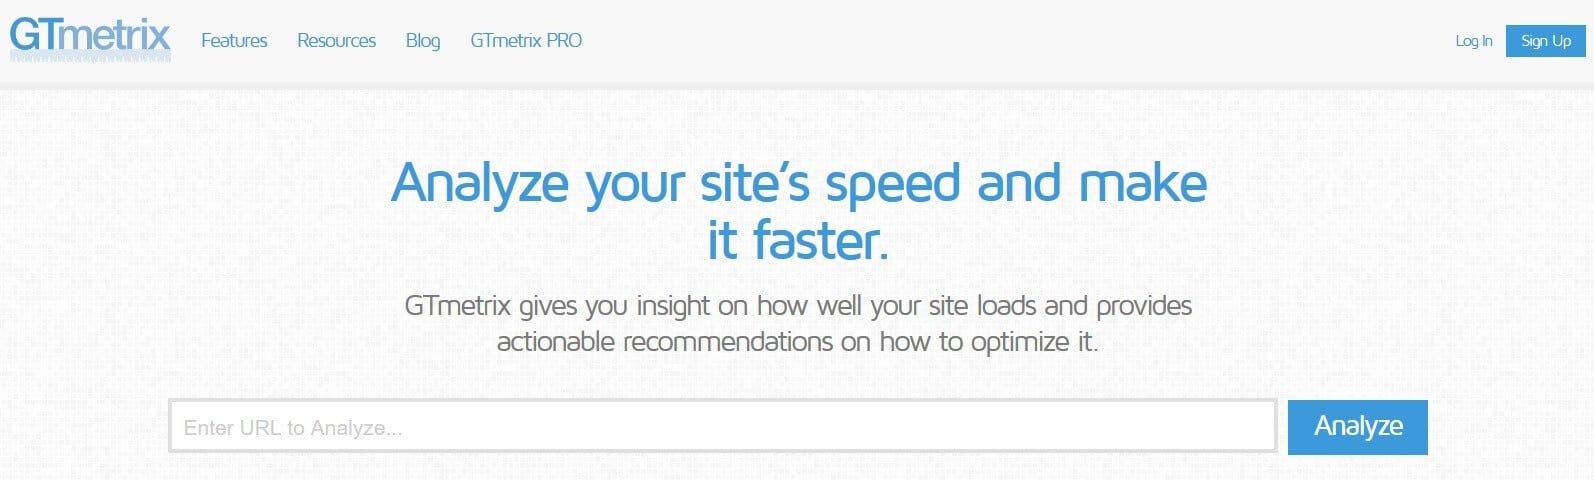 Do Not Use Google Pagespeed Insights To Measure Speed – 3 Alternative Speed Testingtools